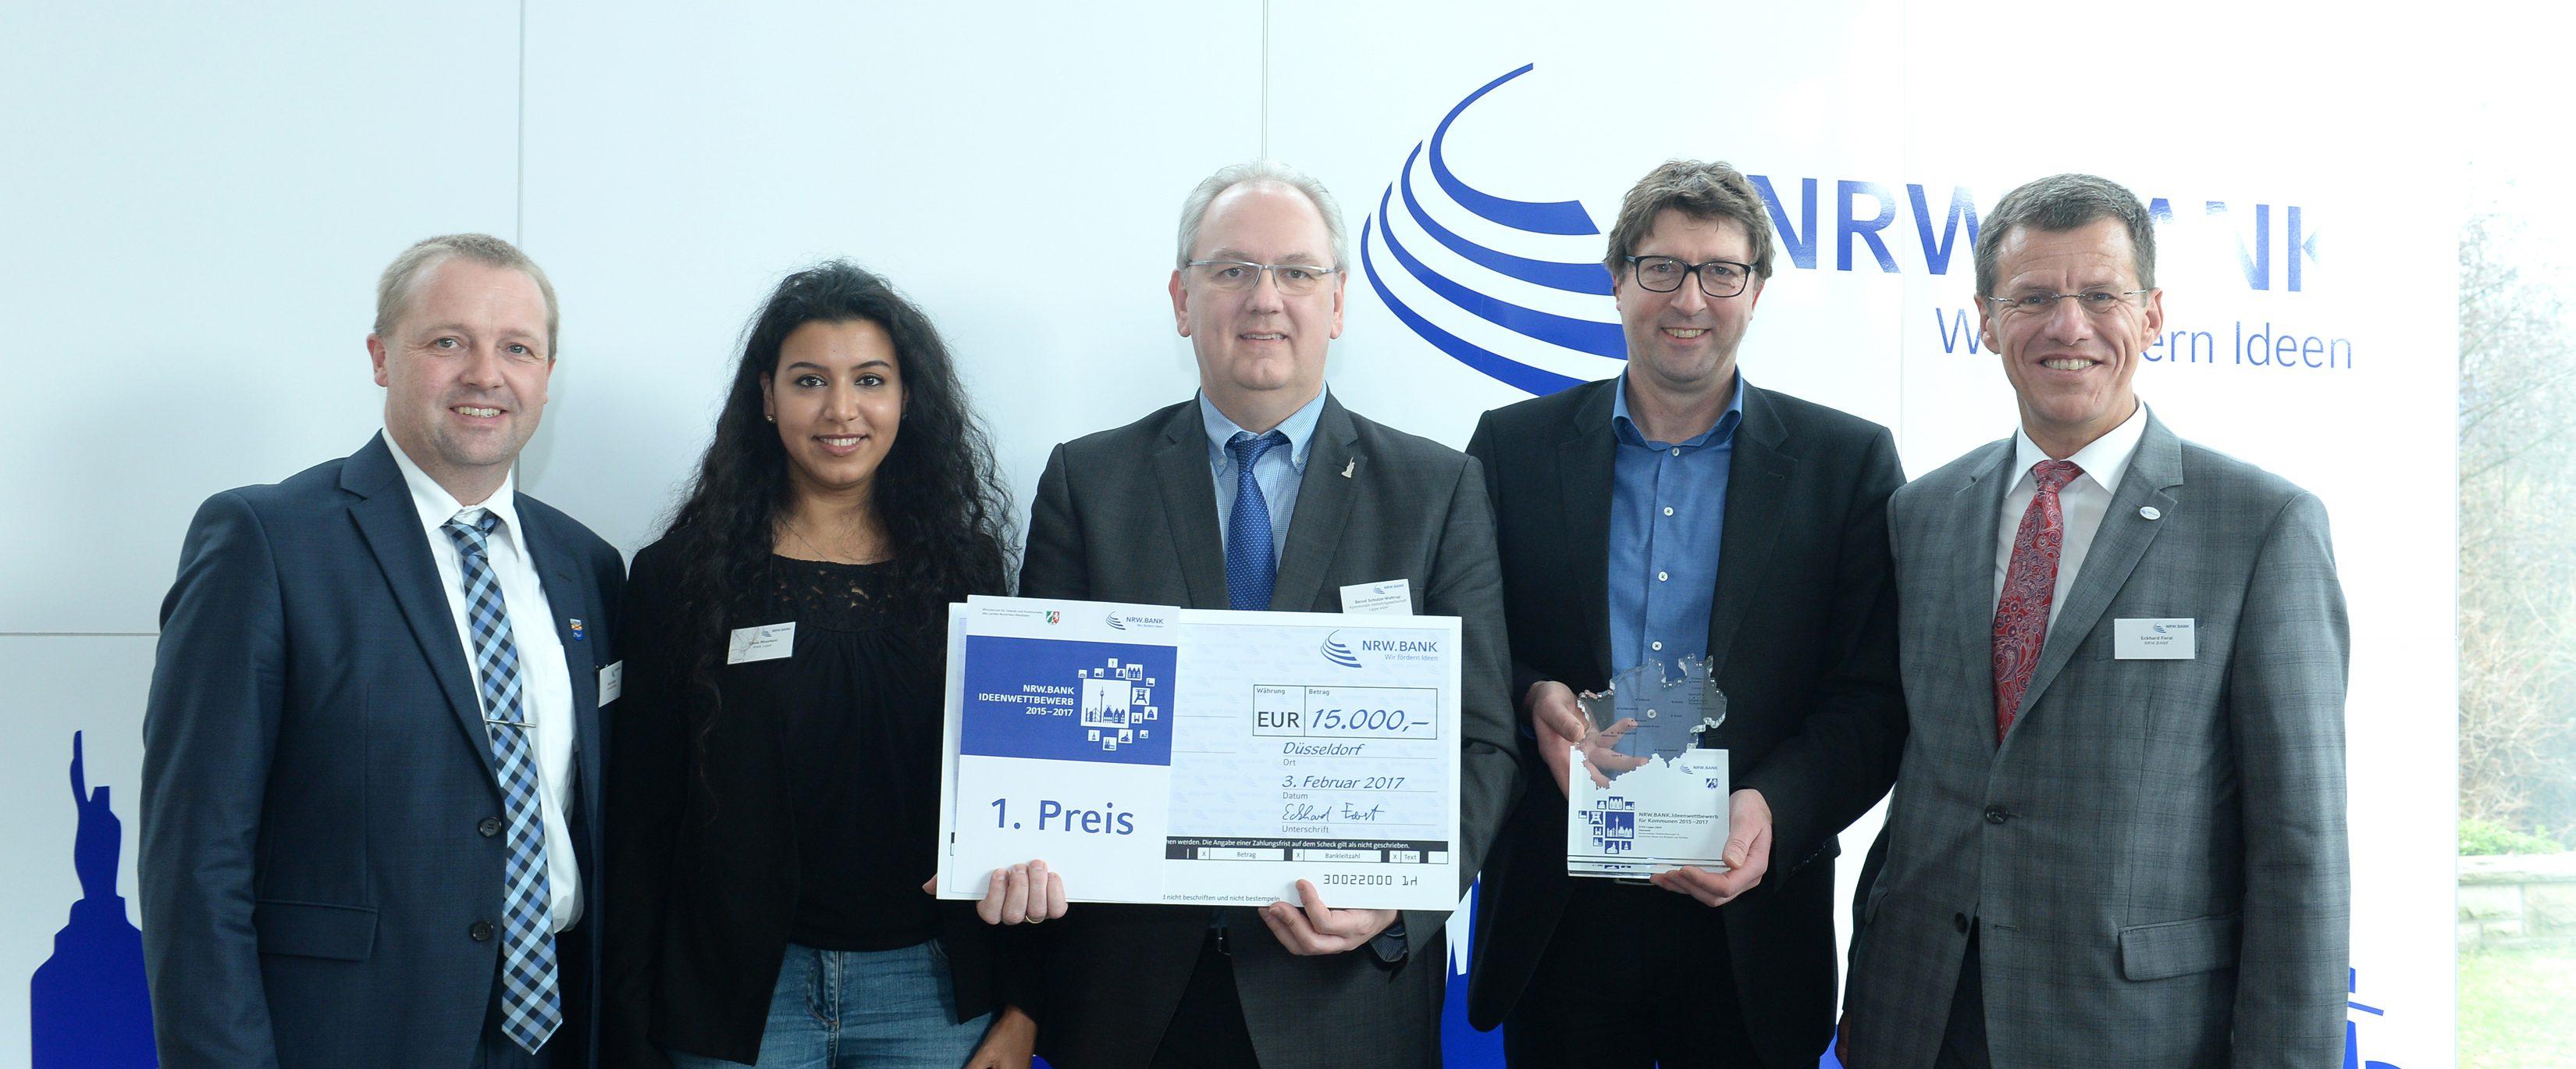 1 Platz Detmold e1486545881842 - NRW.BANK.Ideenwettbewerb 2015-2017